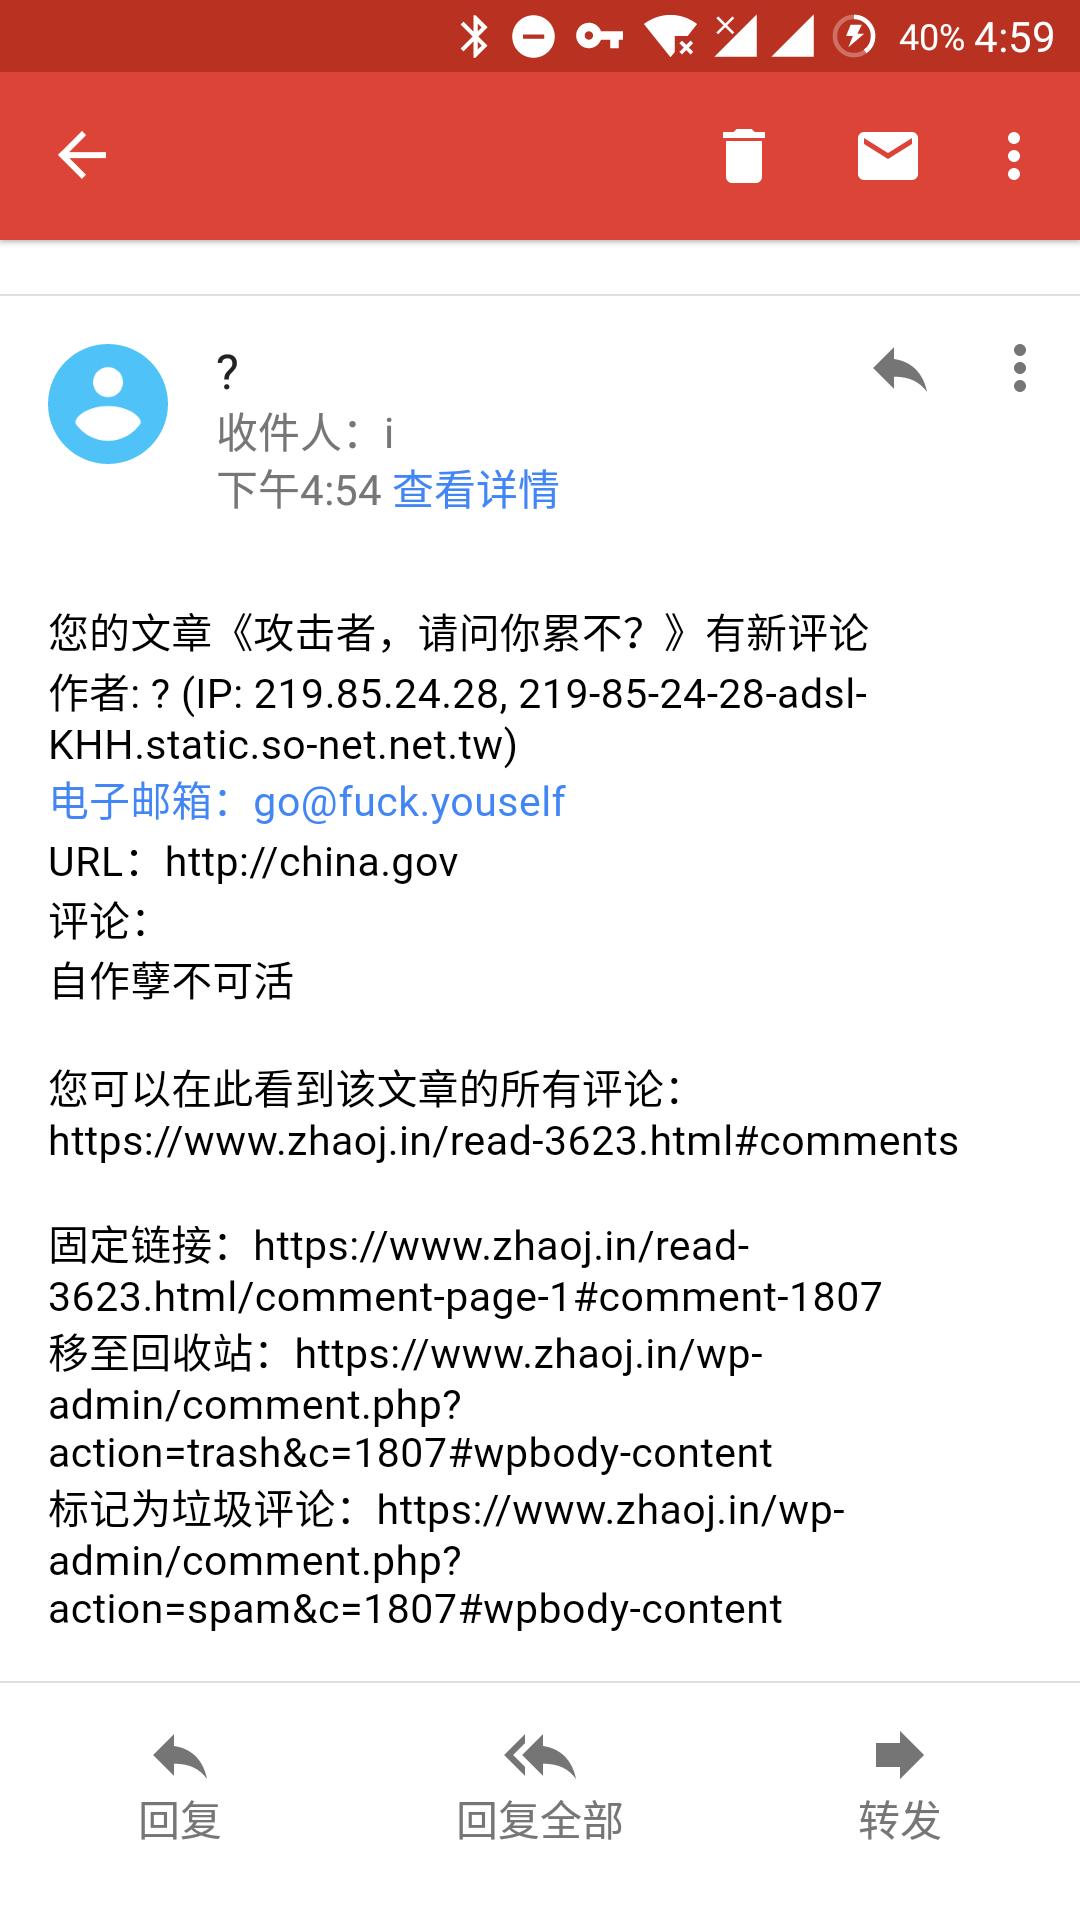 screenshot_20170102-165914